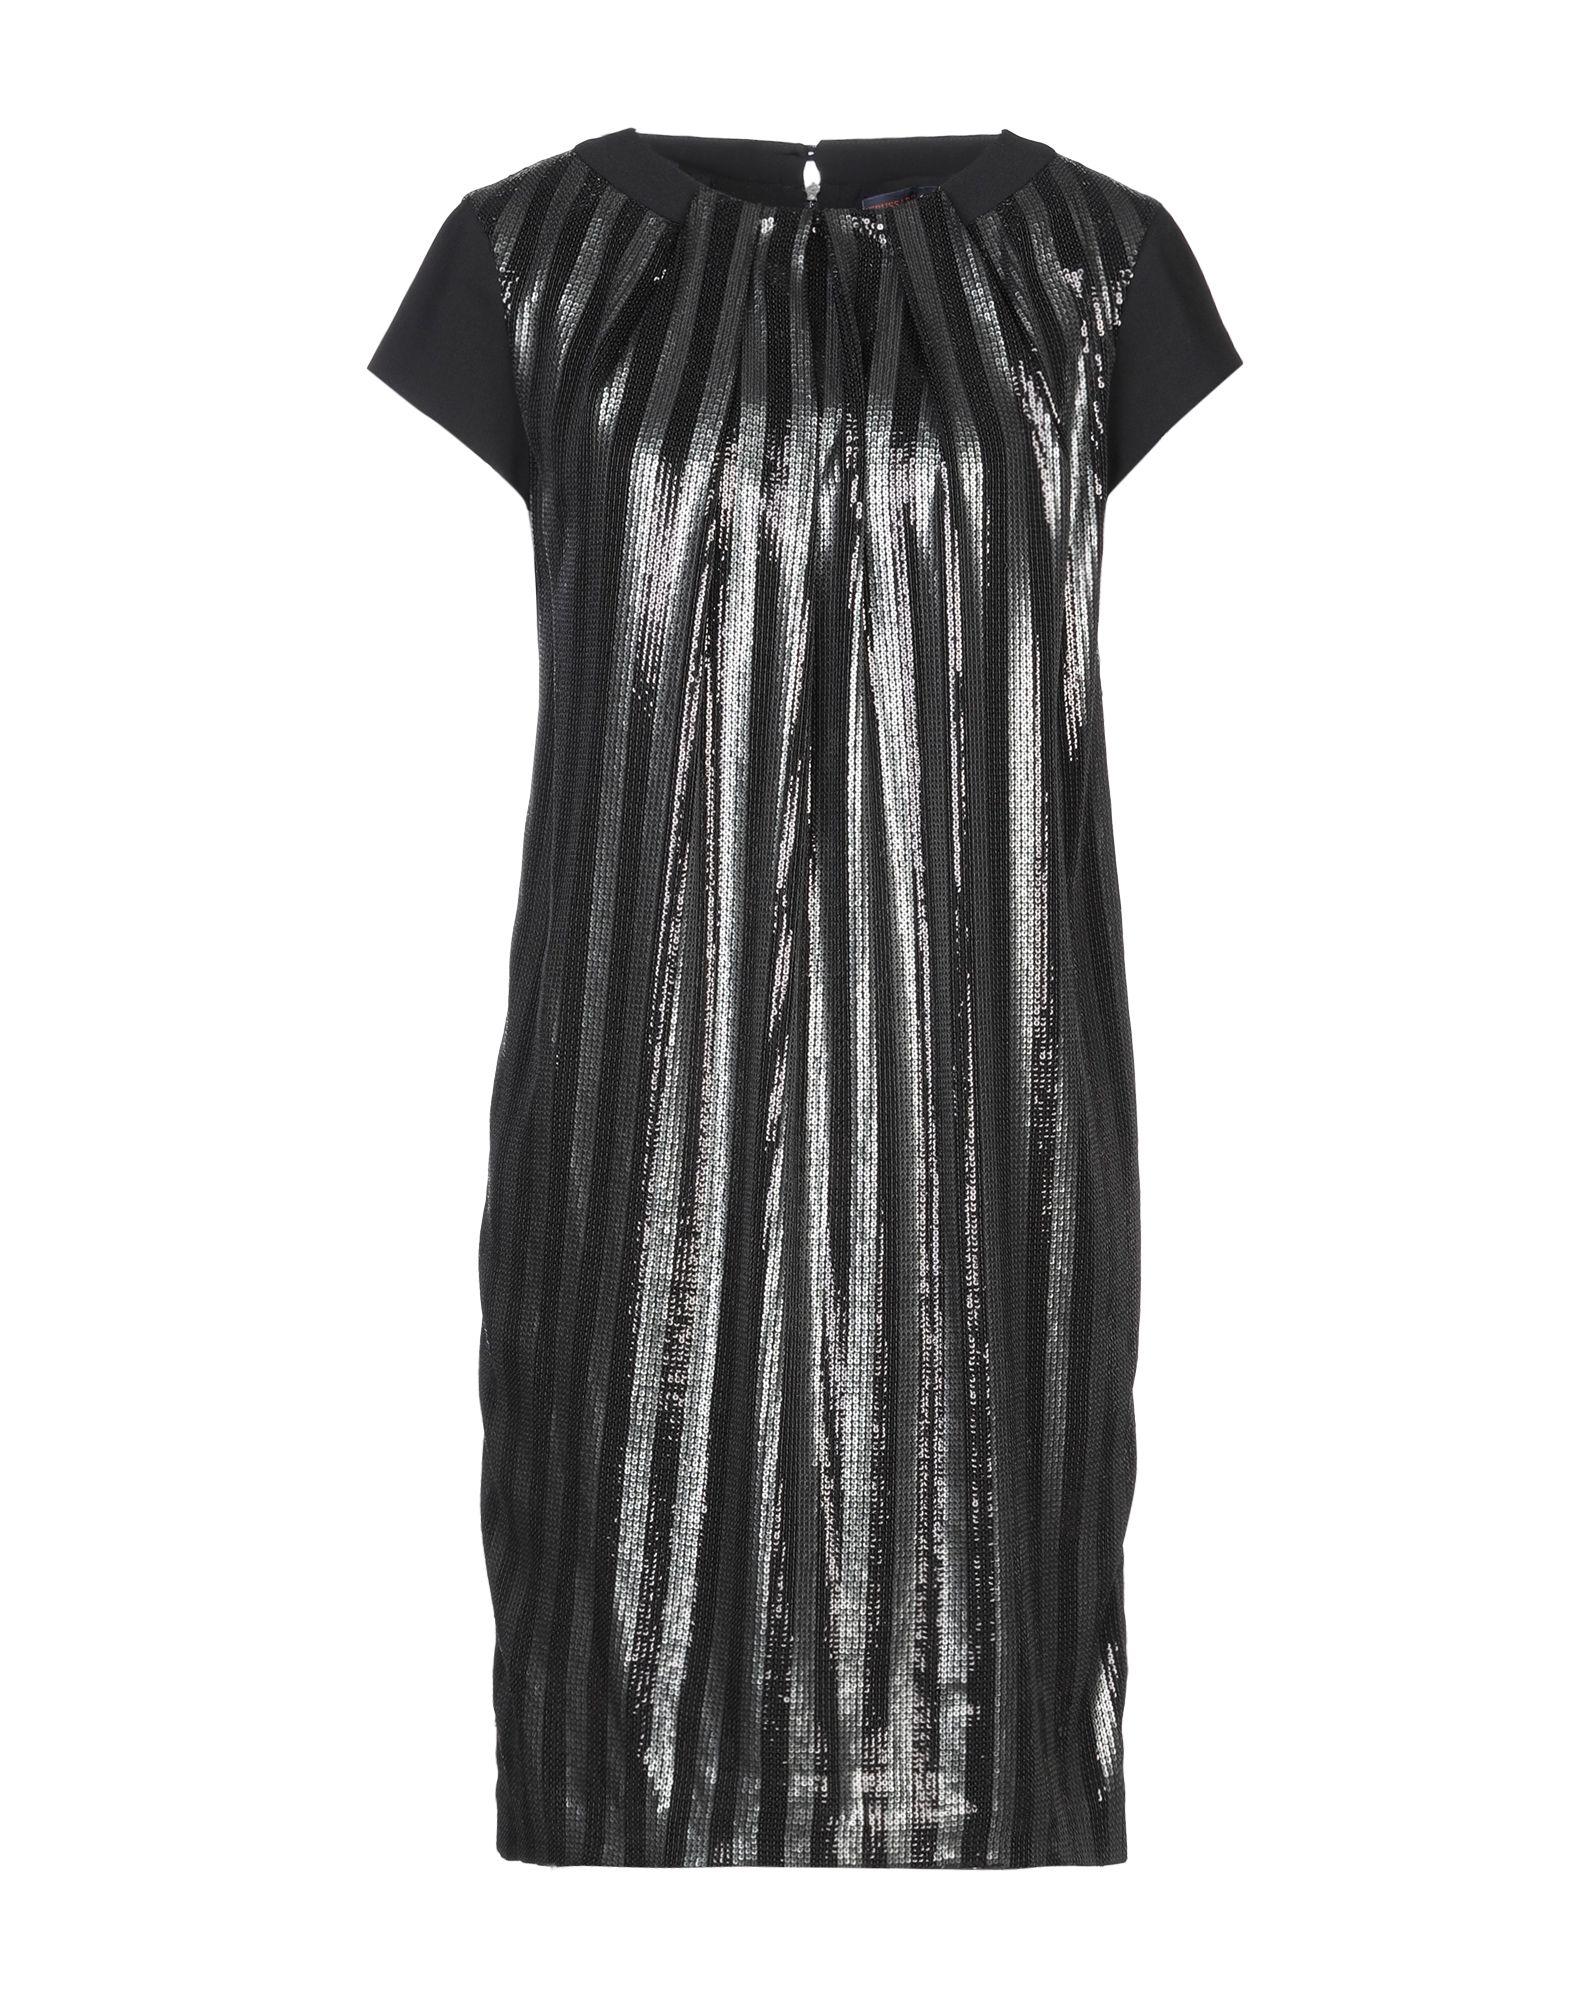 TRU TRUSSARDI Короткое платье платье tru trussardi р l int